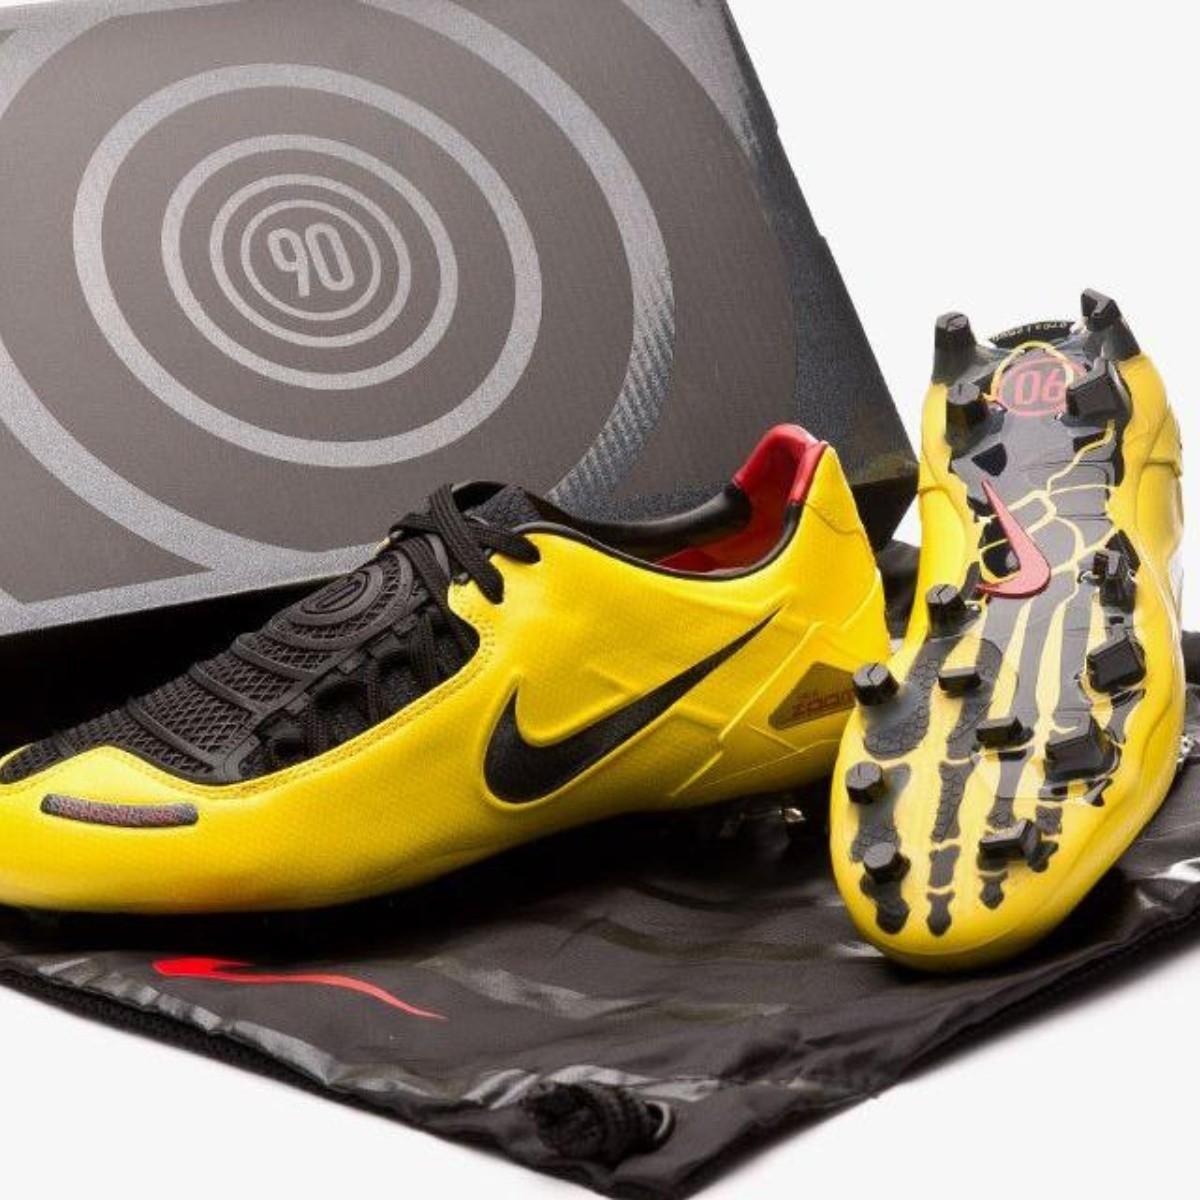 90 Laser Remake Stock Nike Un Míticas Lanzó Total Con Las De T1F3c5luKJ